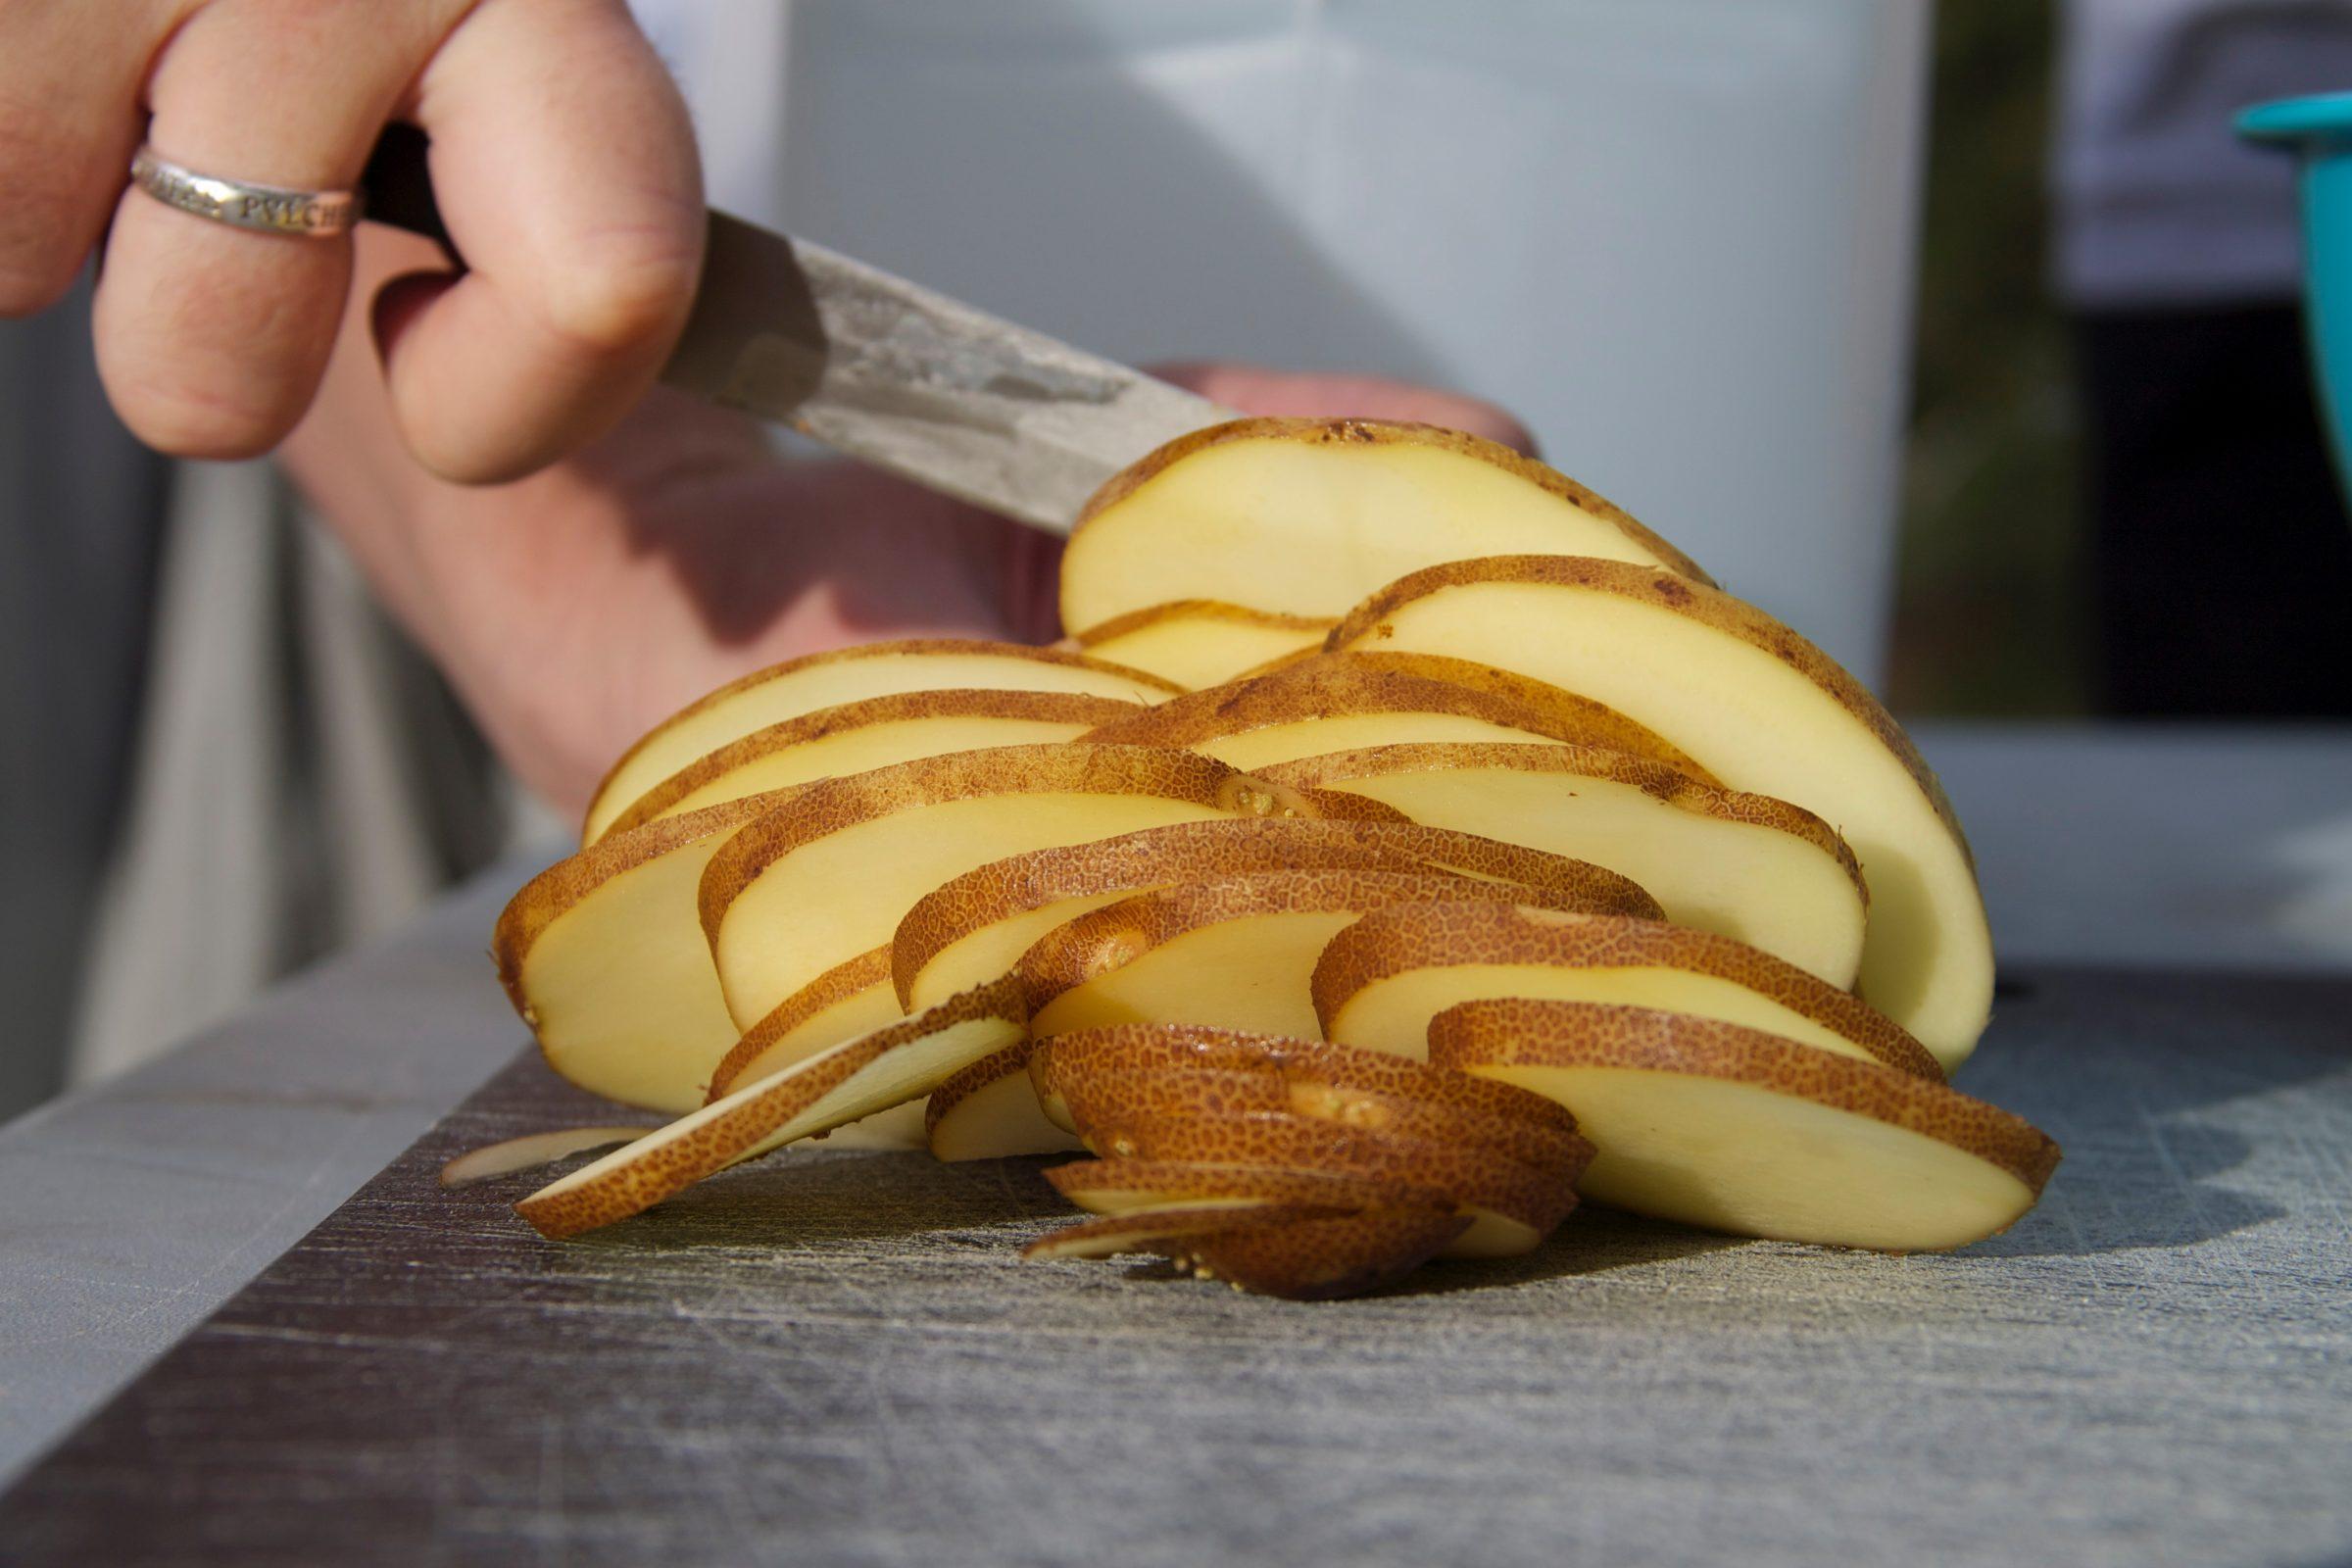 Knife Cutting Potato Slices